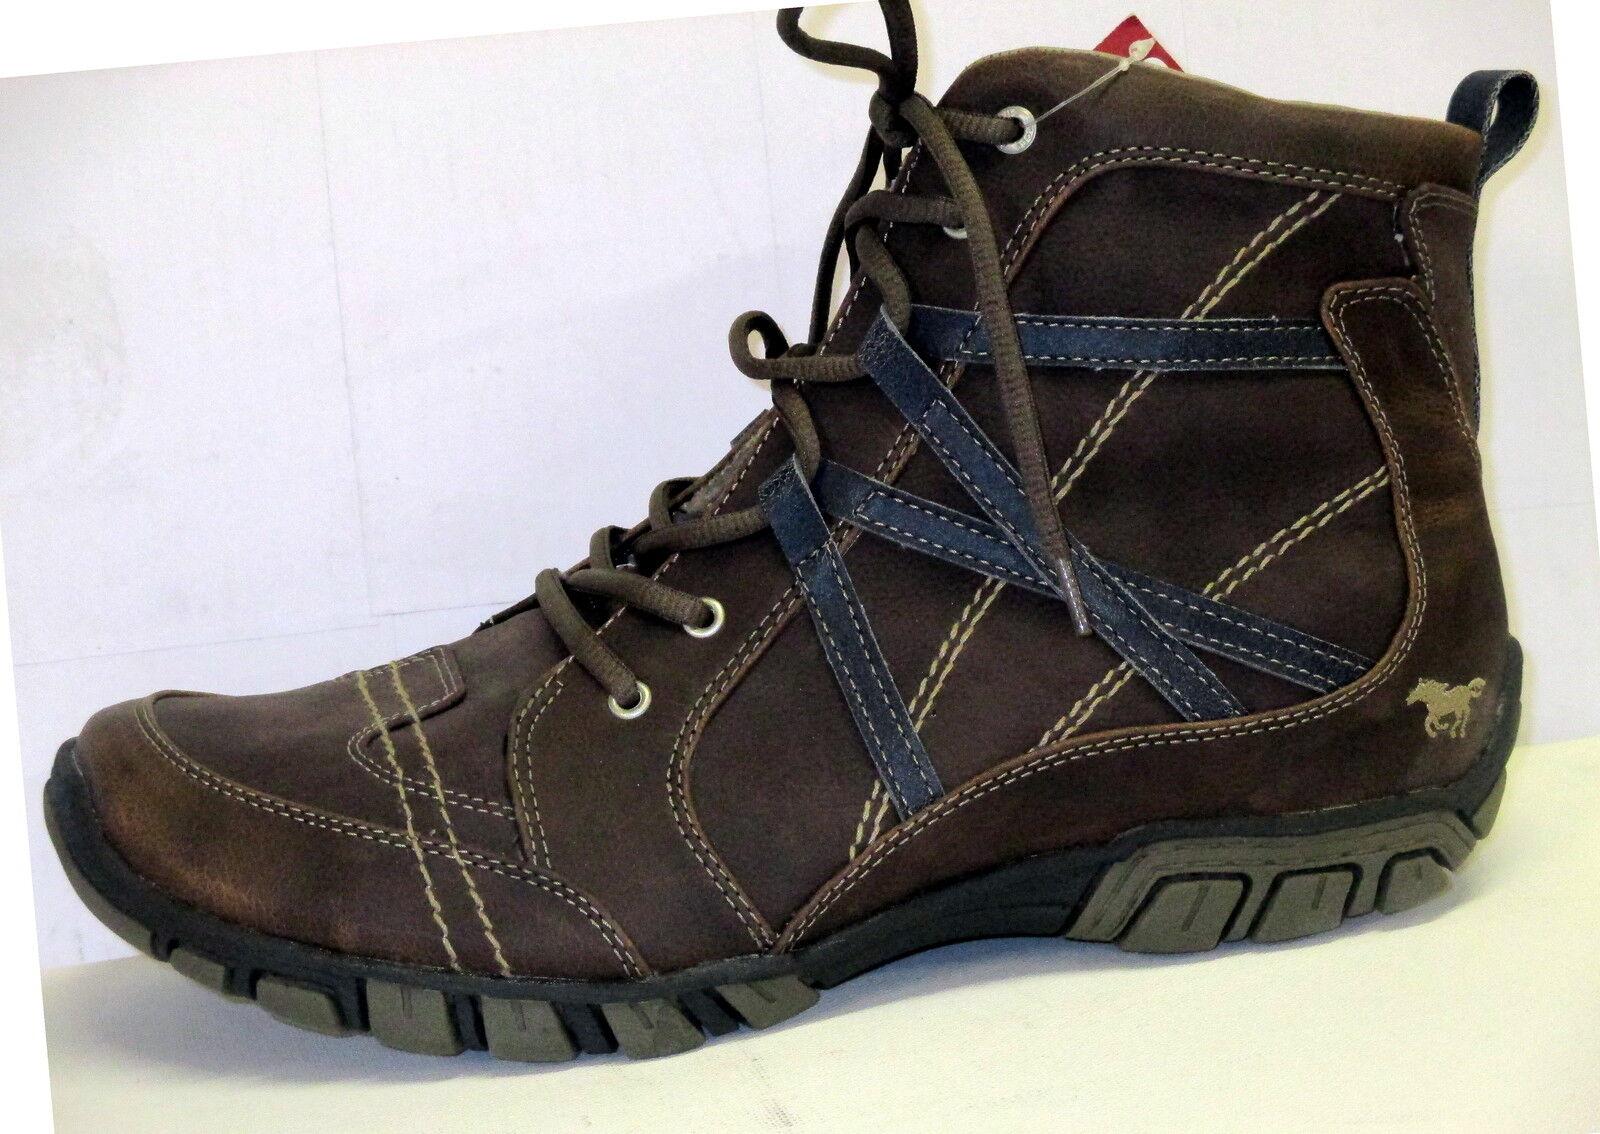 Mustang  Herren Schuhe Winterstifel in  Übergröße, Art.4002-601-32 +++NEU+++